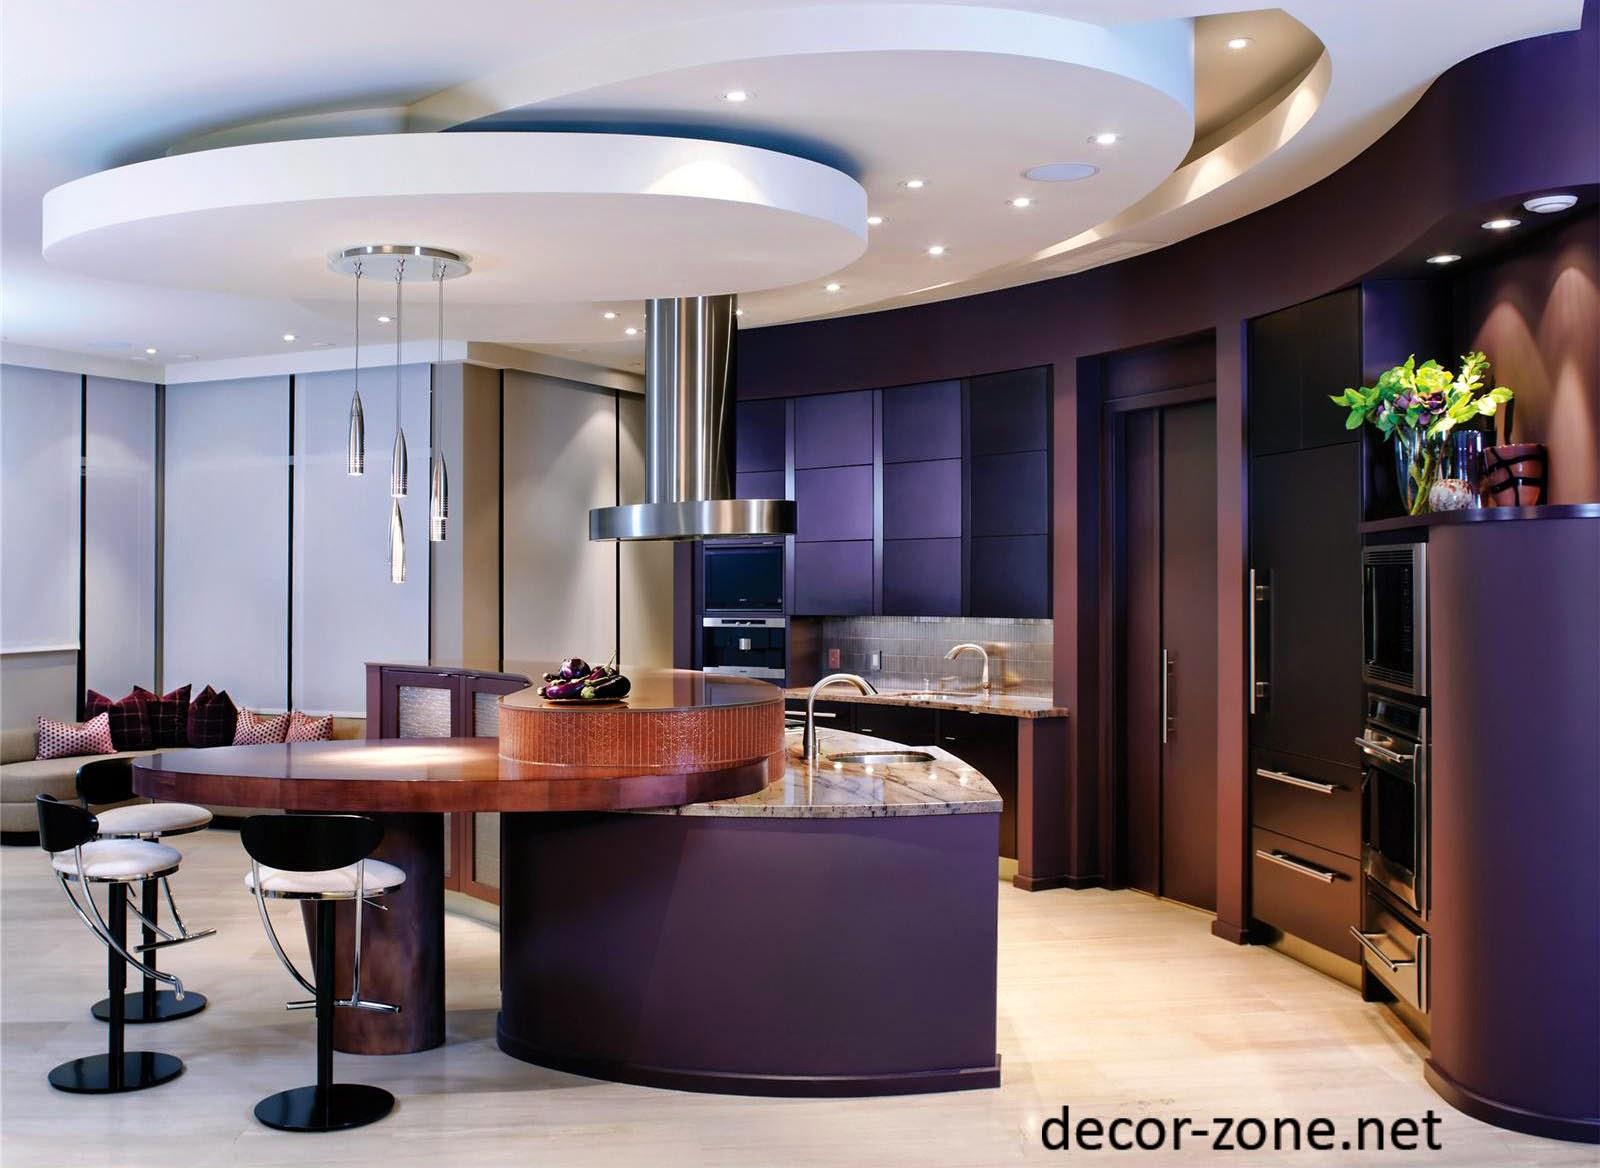 kitchen ceiling ideas gypsum false ceiling design